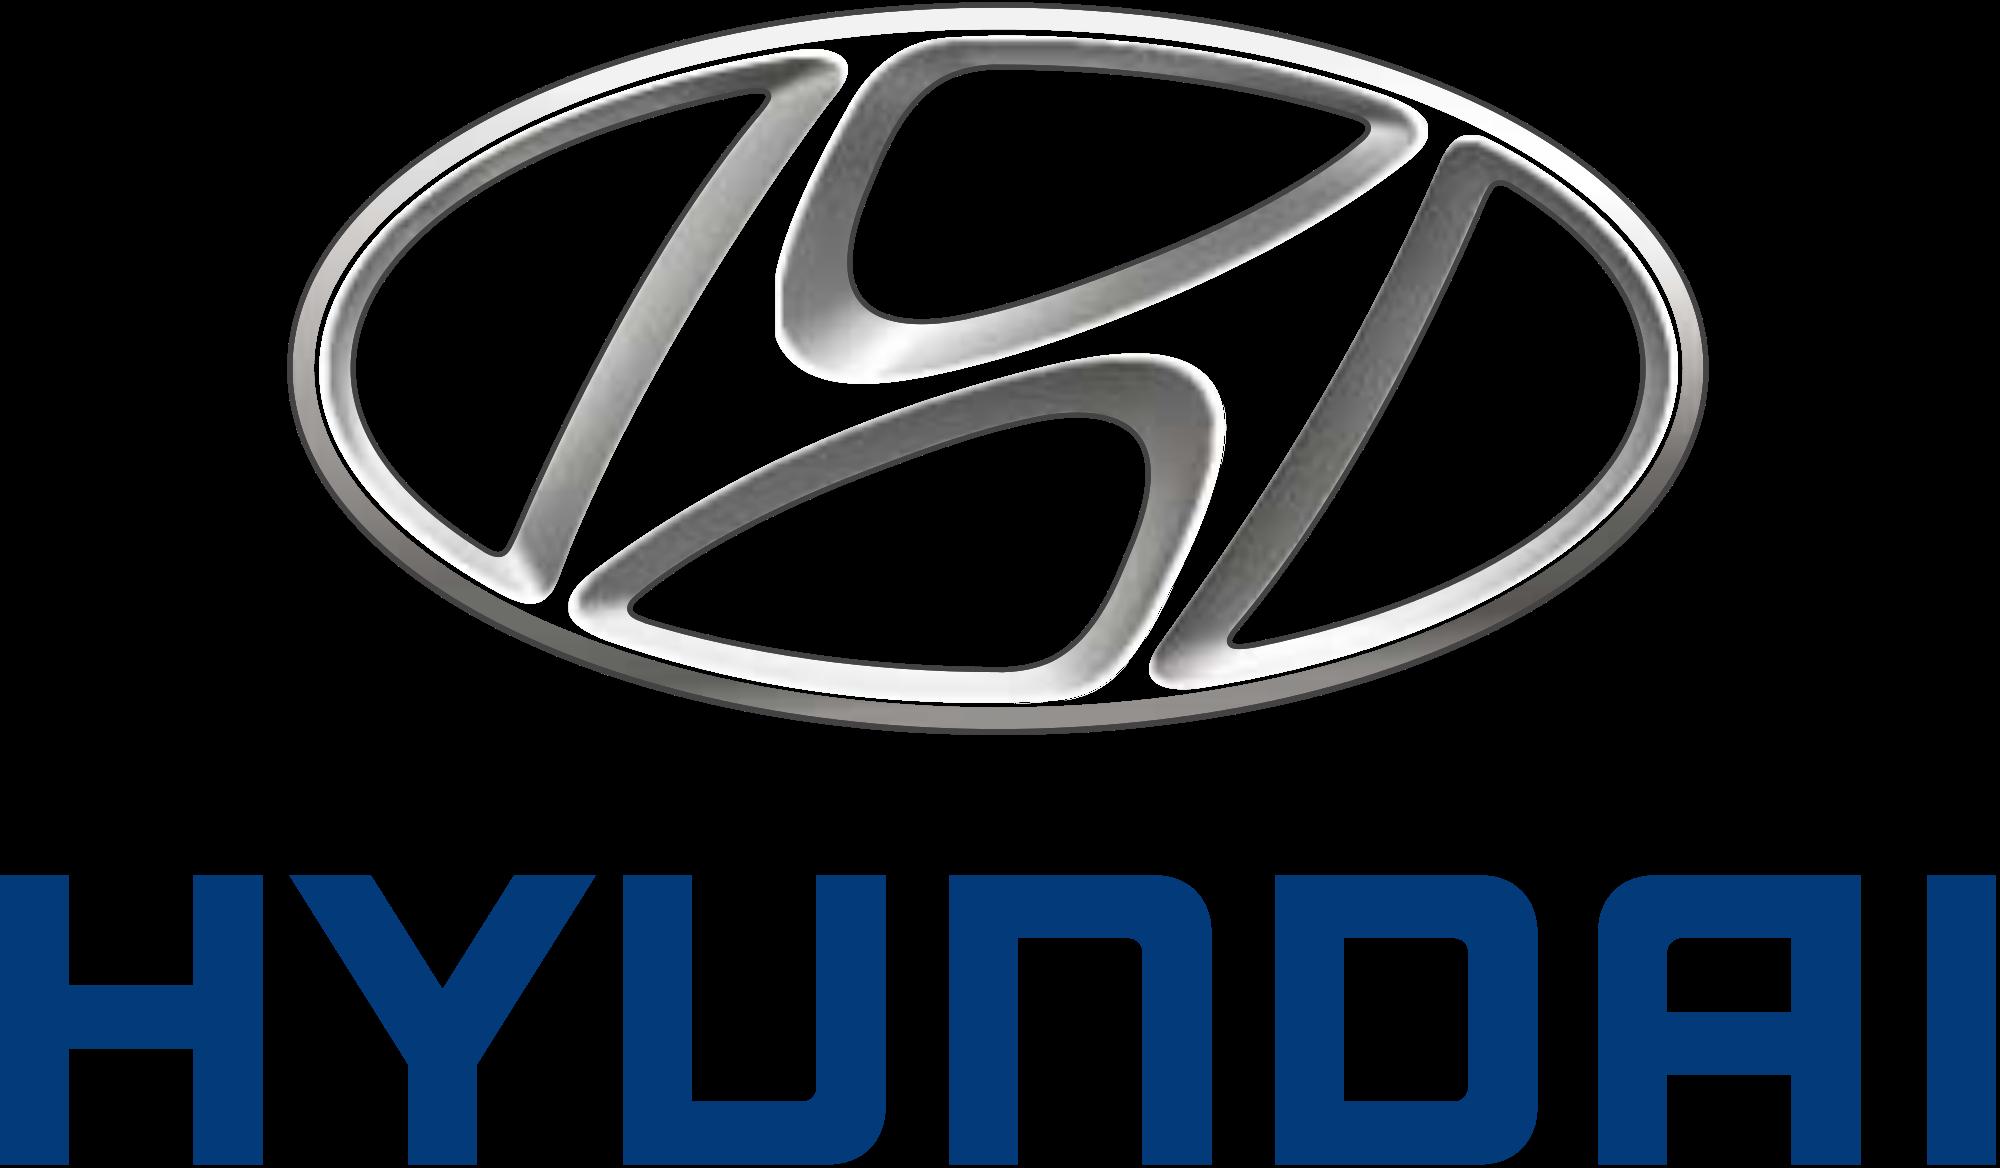 Hyundai Auto Logo - Car, Transparent background PNG HD thumbnail